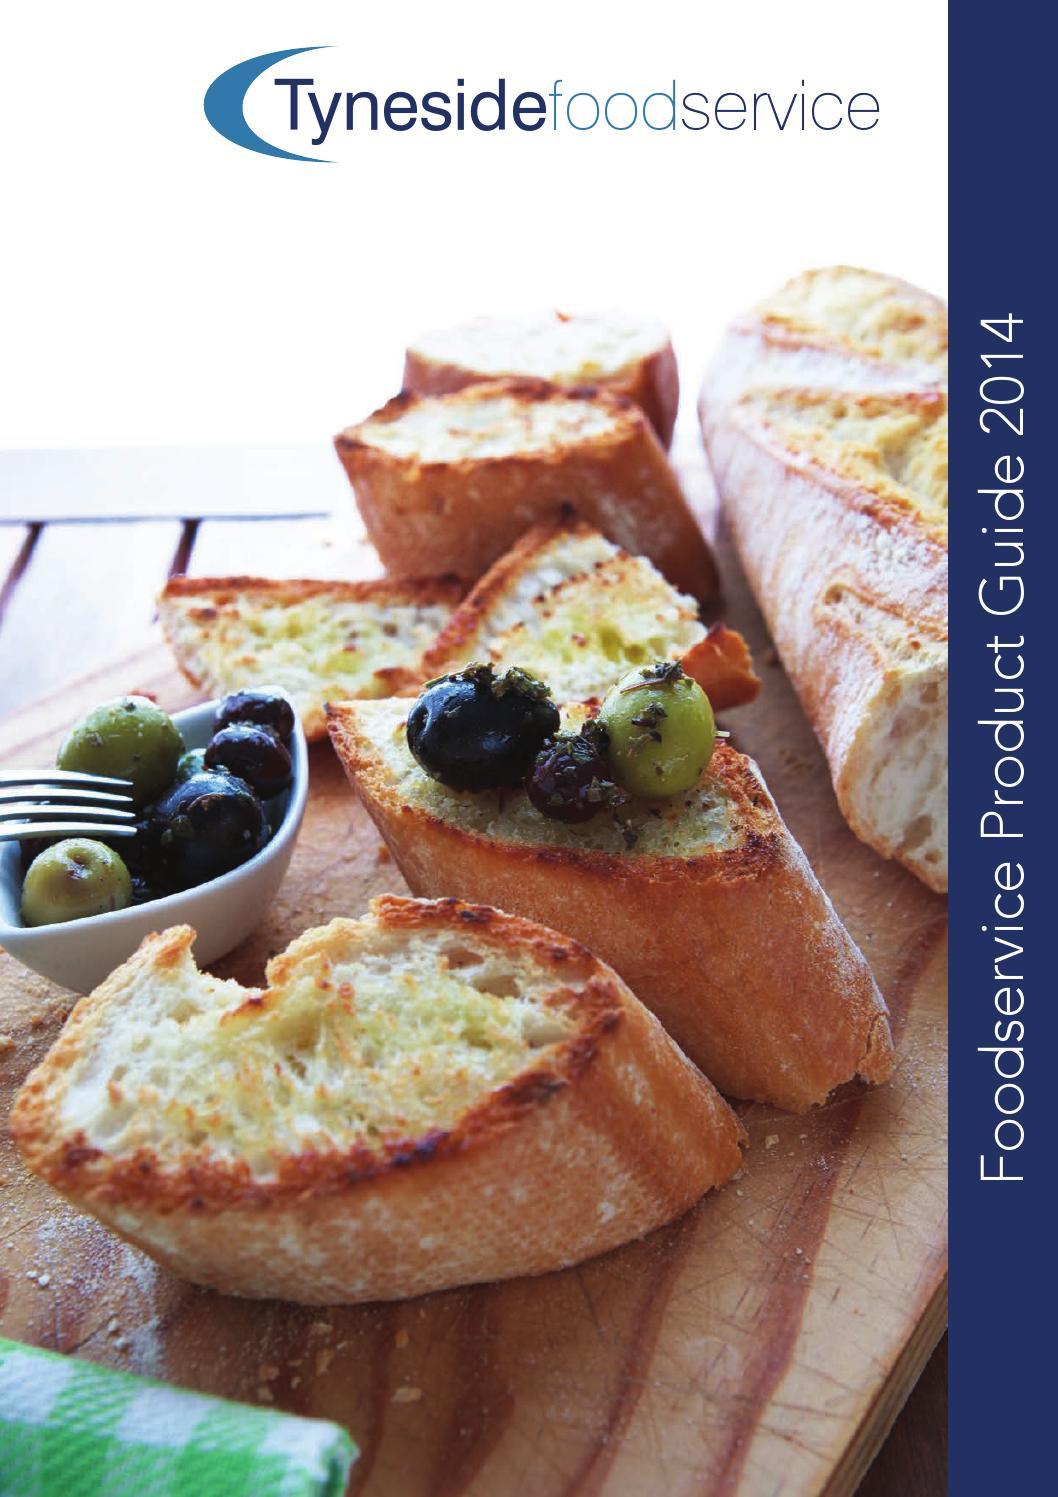 Promo Tempat Fruchips Keripik Buah Nangka Cek Terbaik Update 2018 Apel 2014 Product List By Tyneside Foodservice Limited Issuu